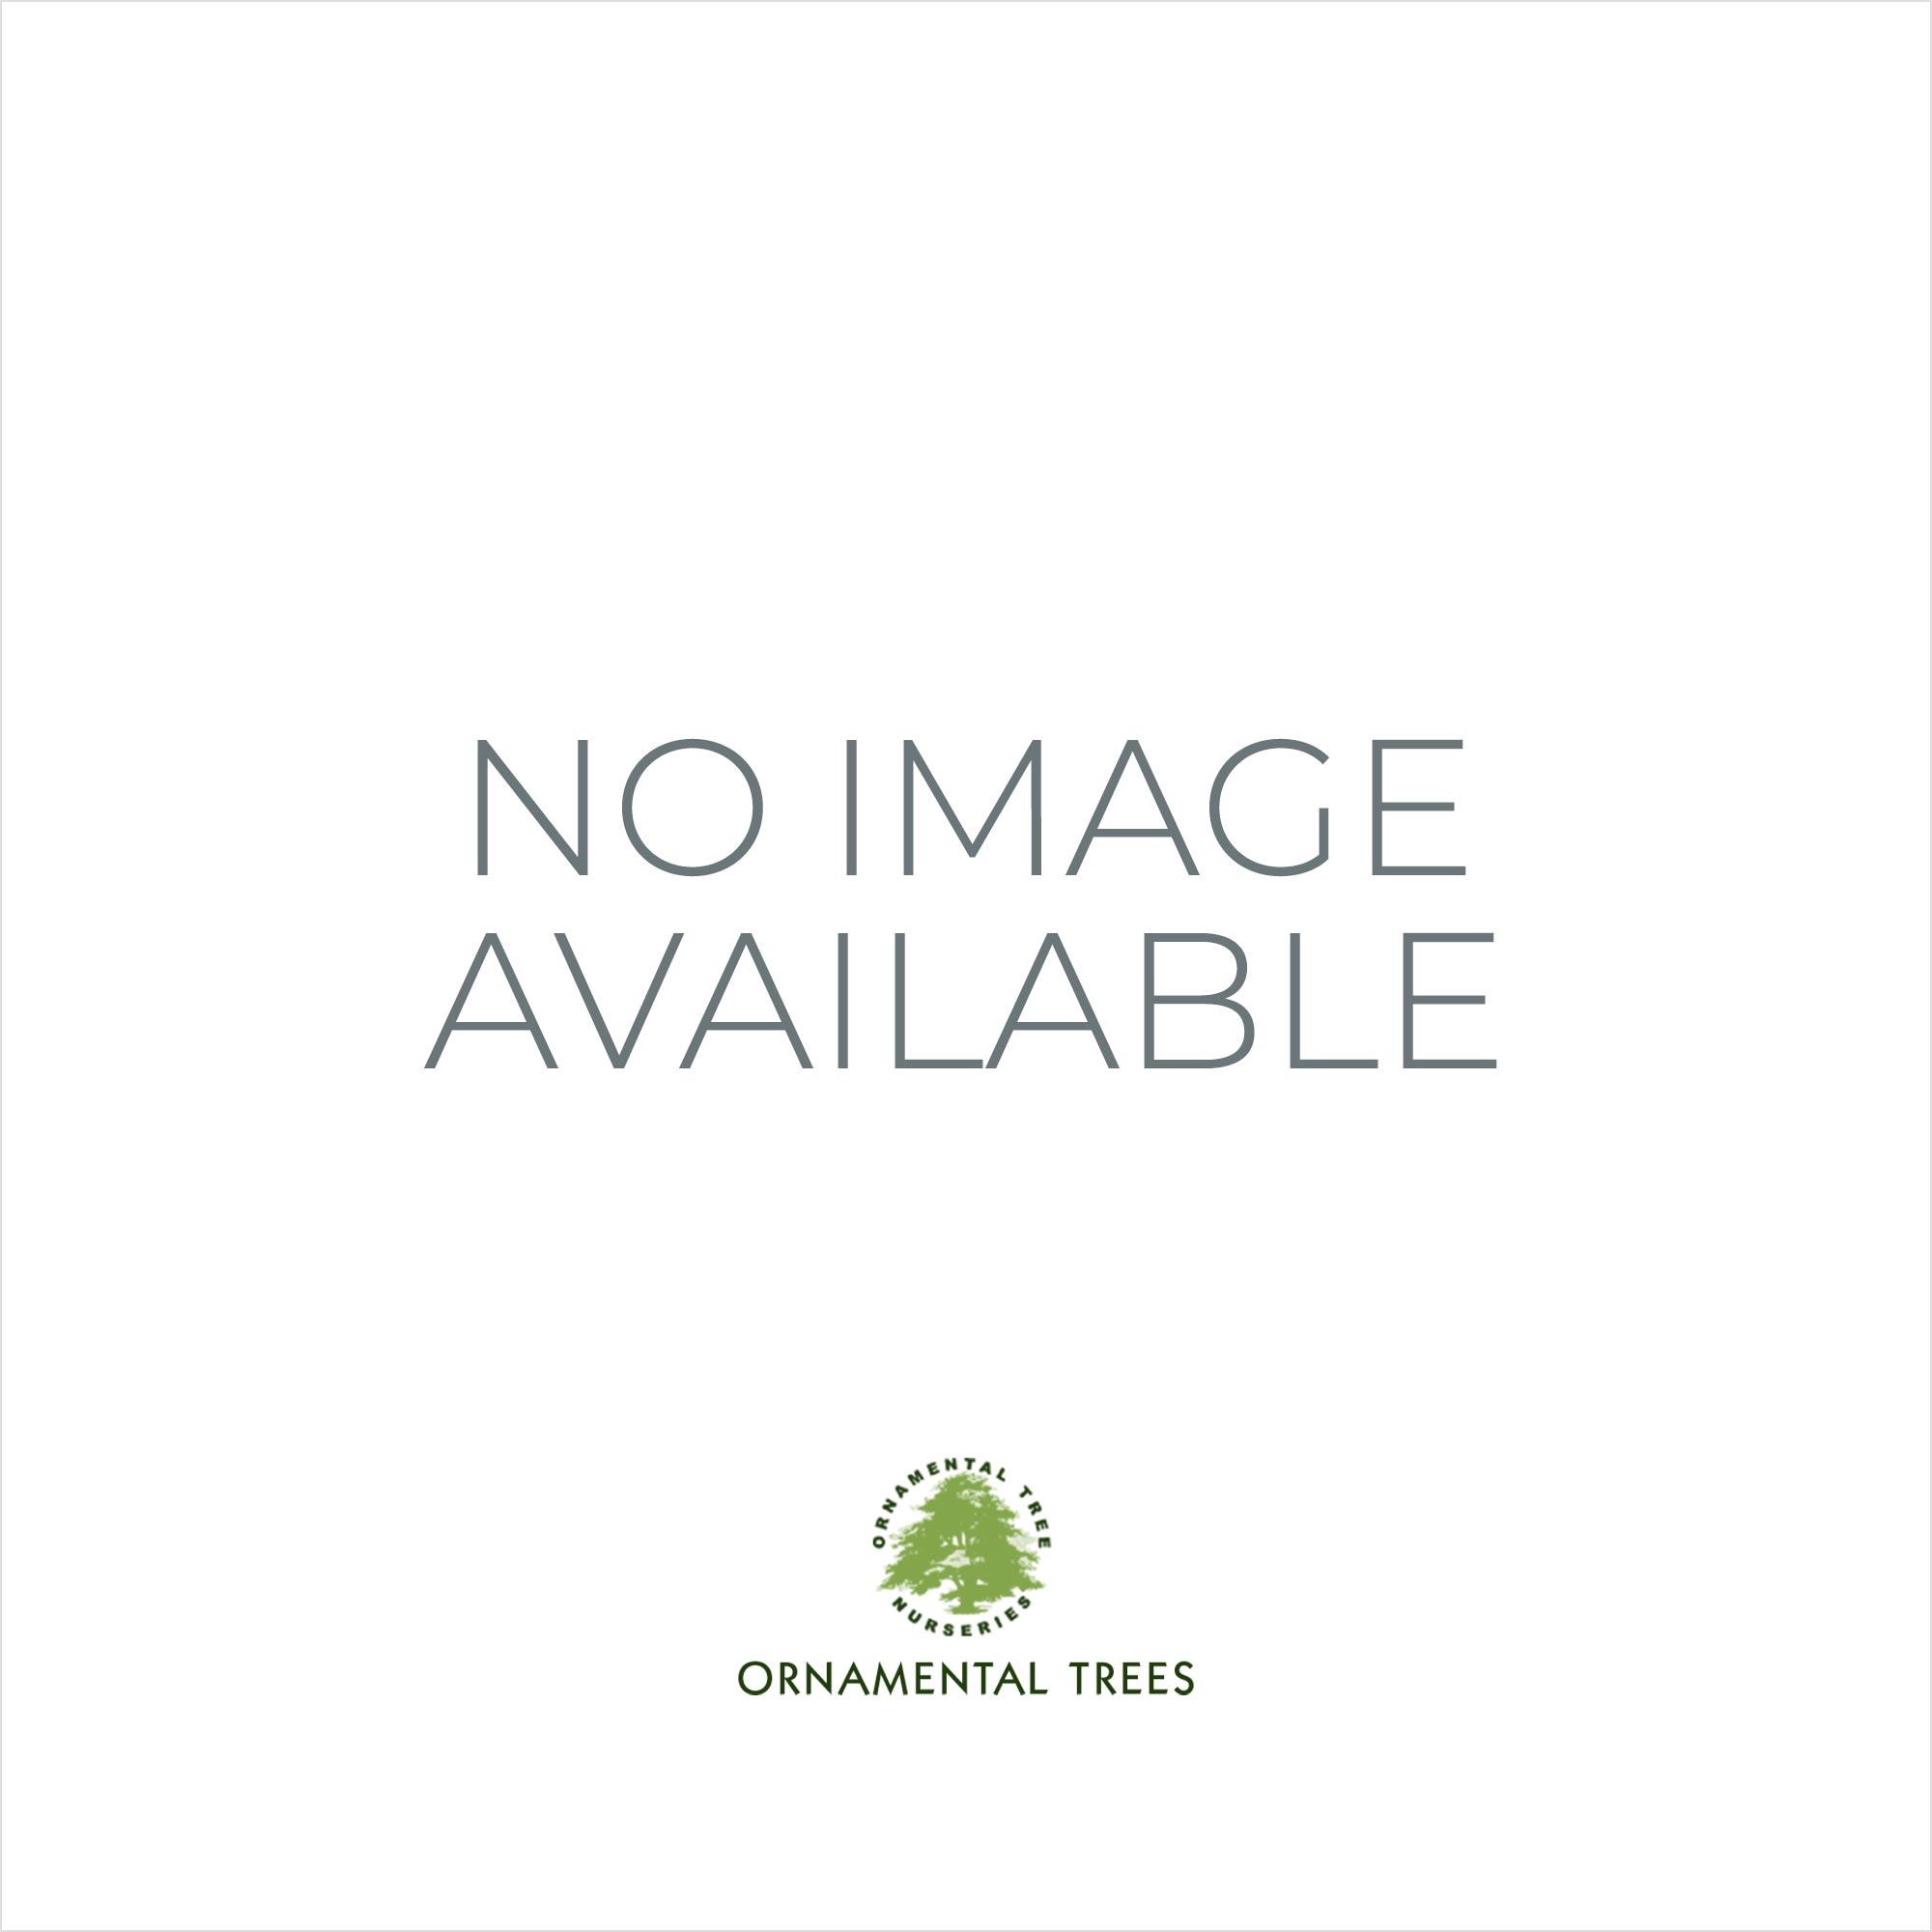 The Best Ornamental Flowering Trees - ChestofBooks.com: Read Books